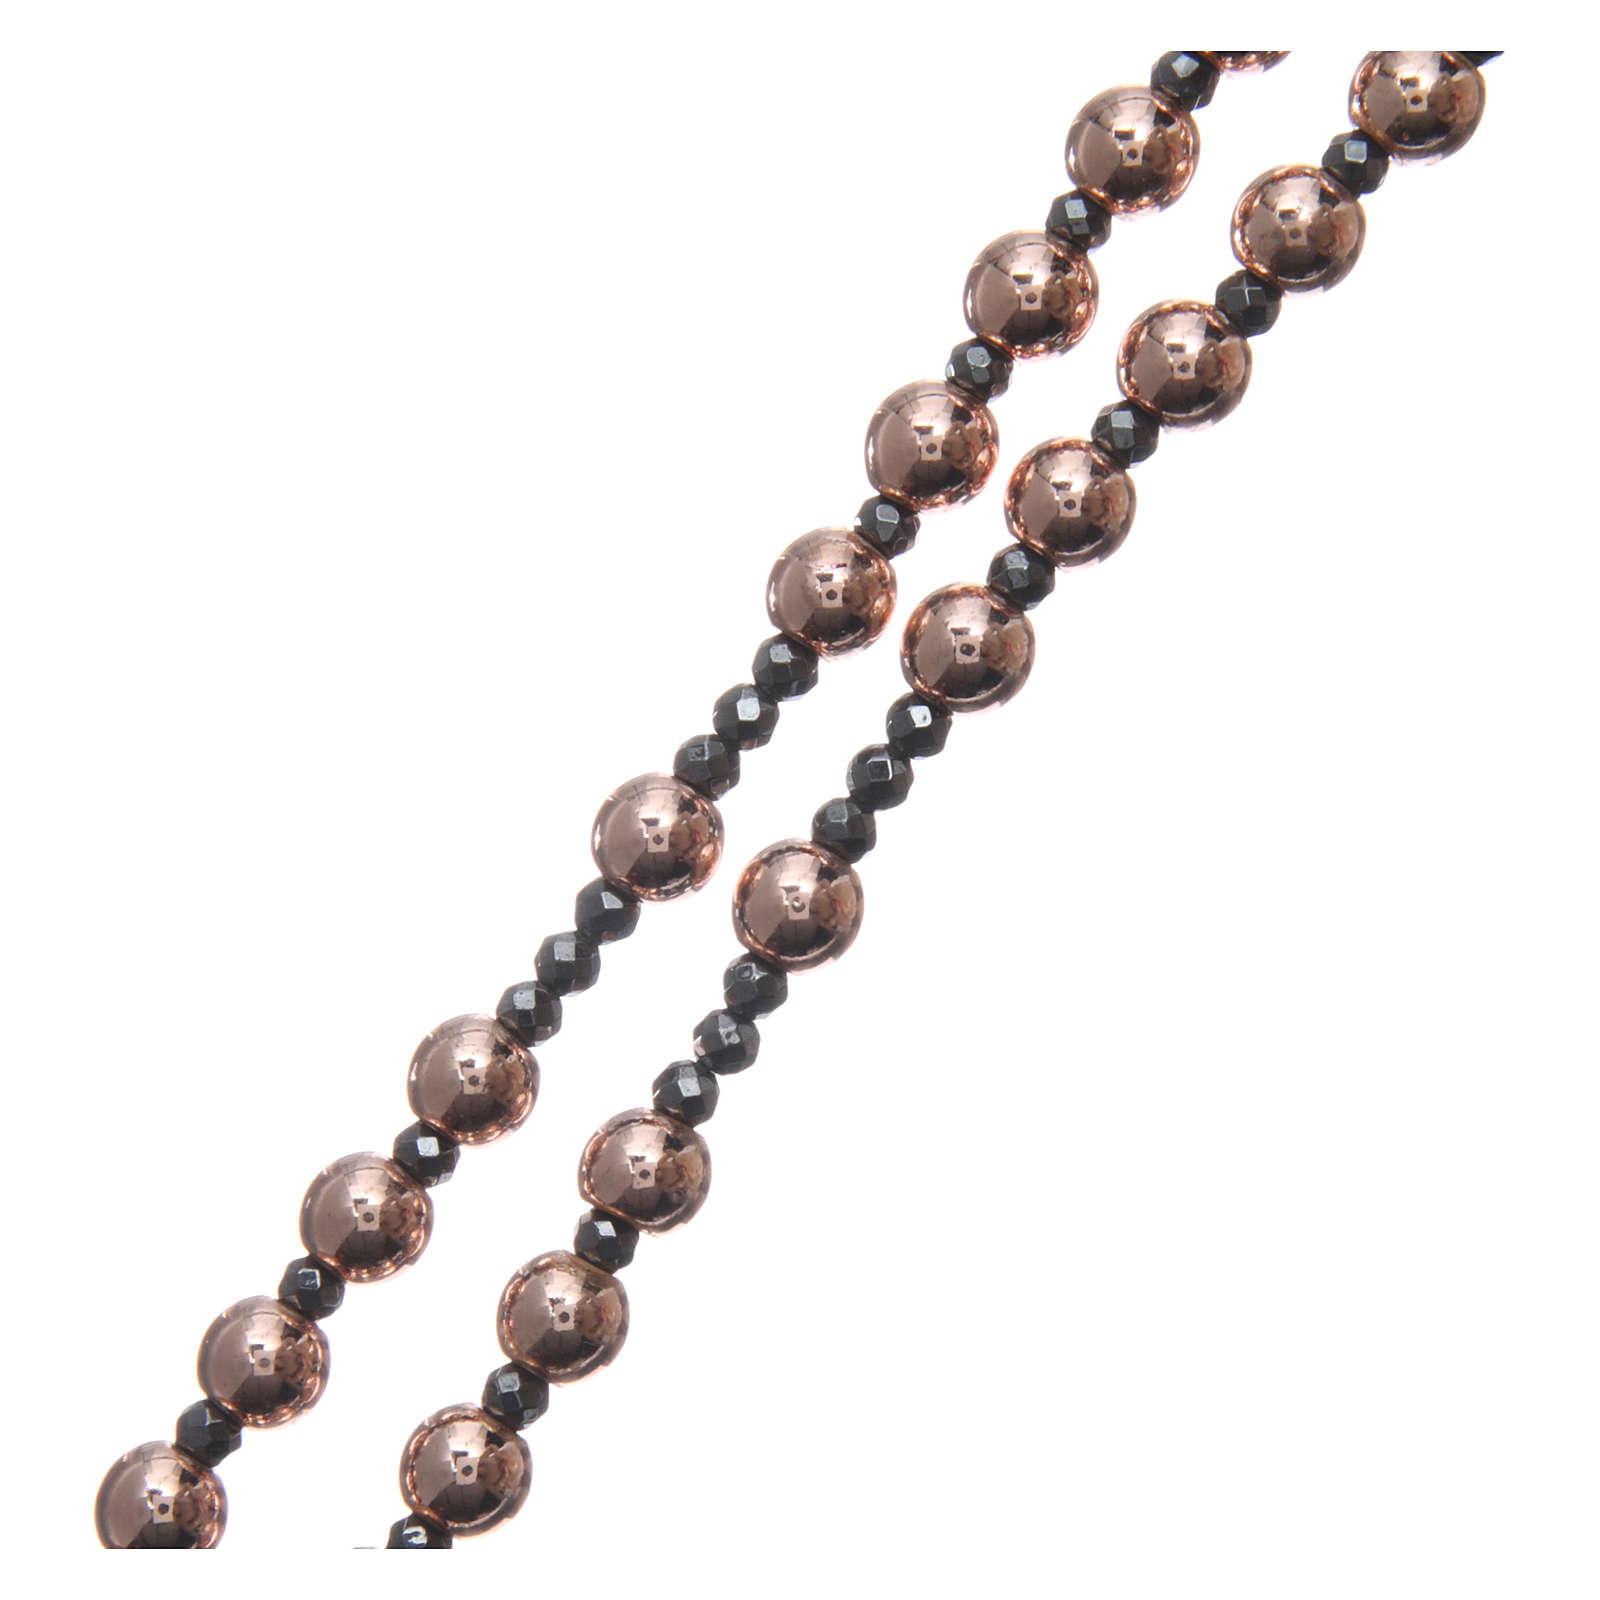 Rosario argento 925 cavetto palline lisce ematite rosé 6 mm e sfacc 3 mm 4